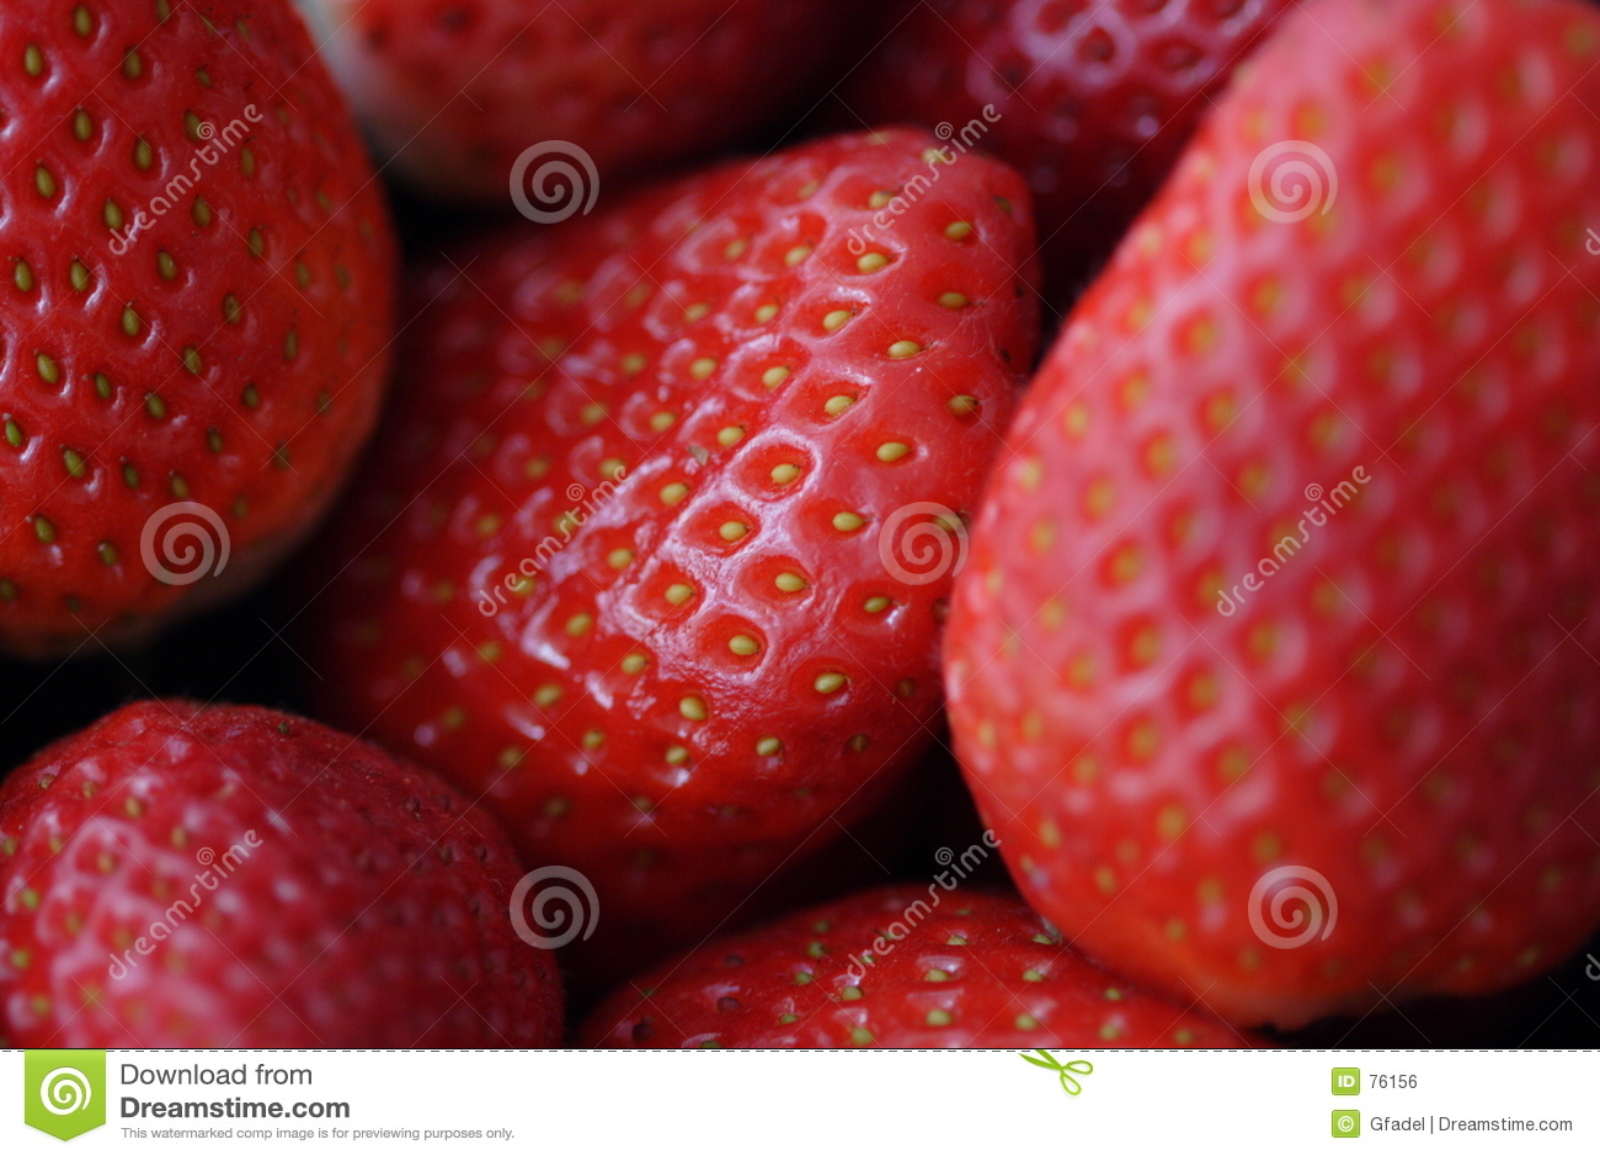 Strawberries I